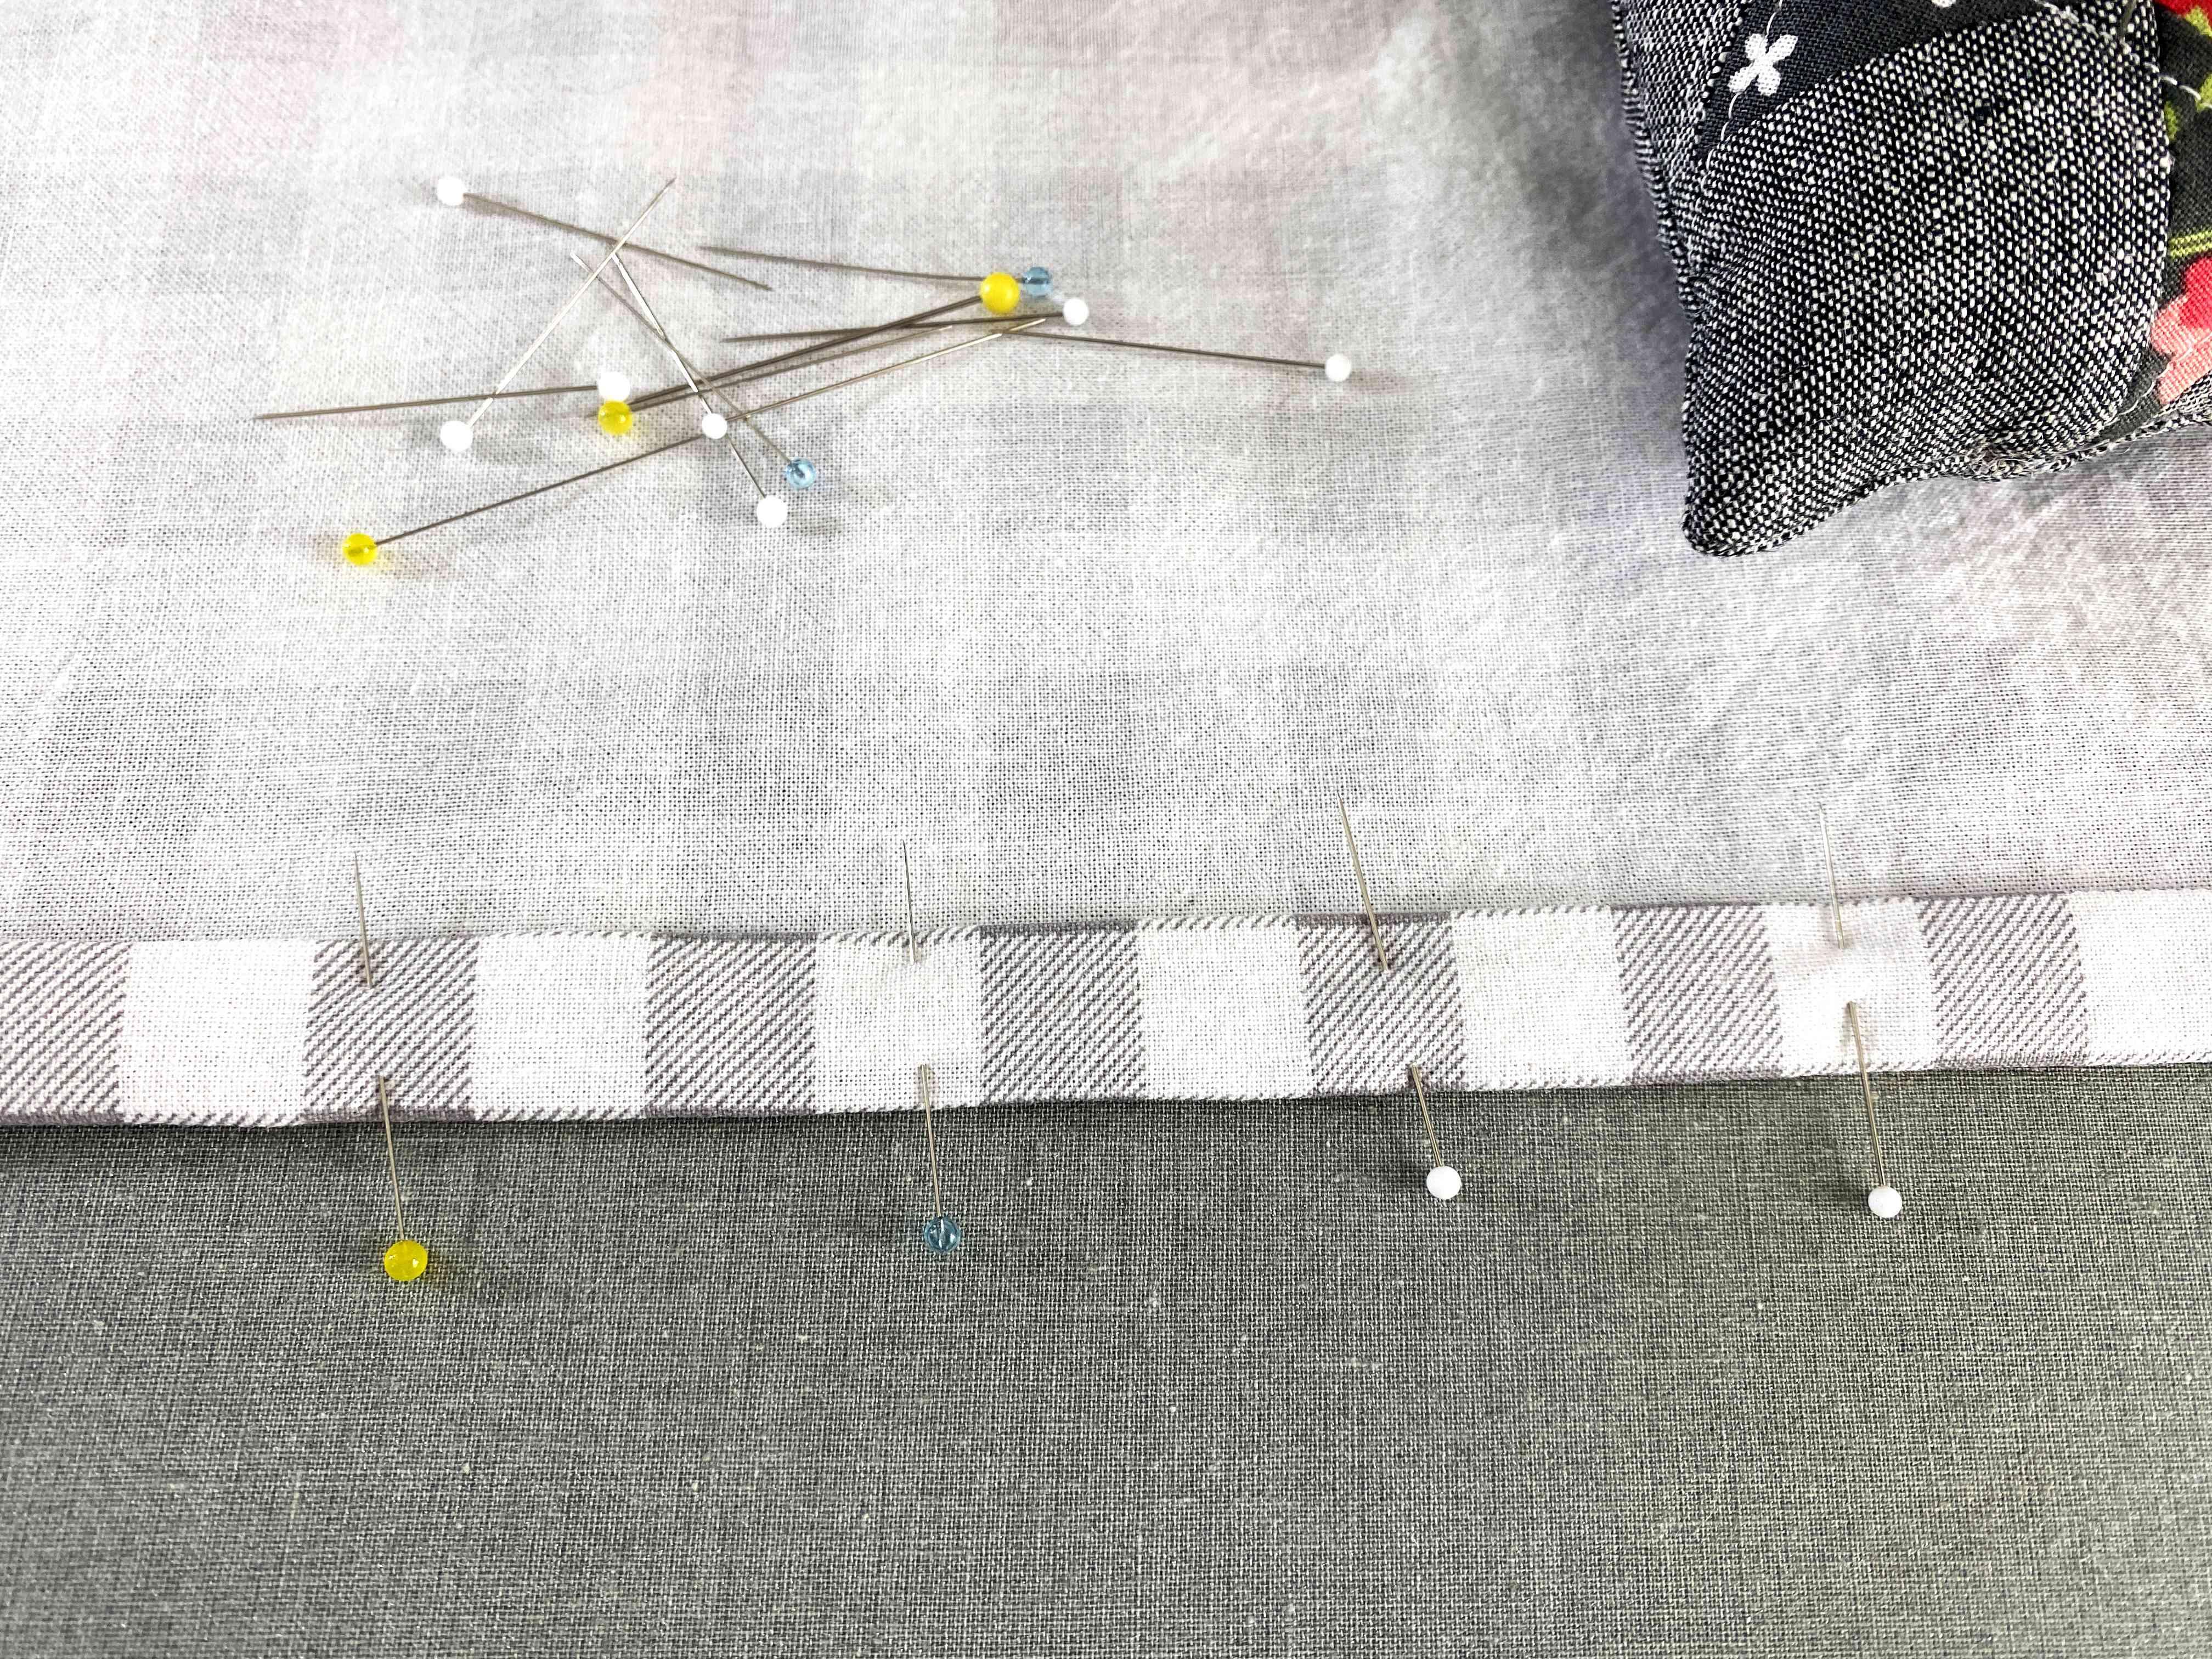 Pins hemming the edge of fabric